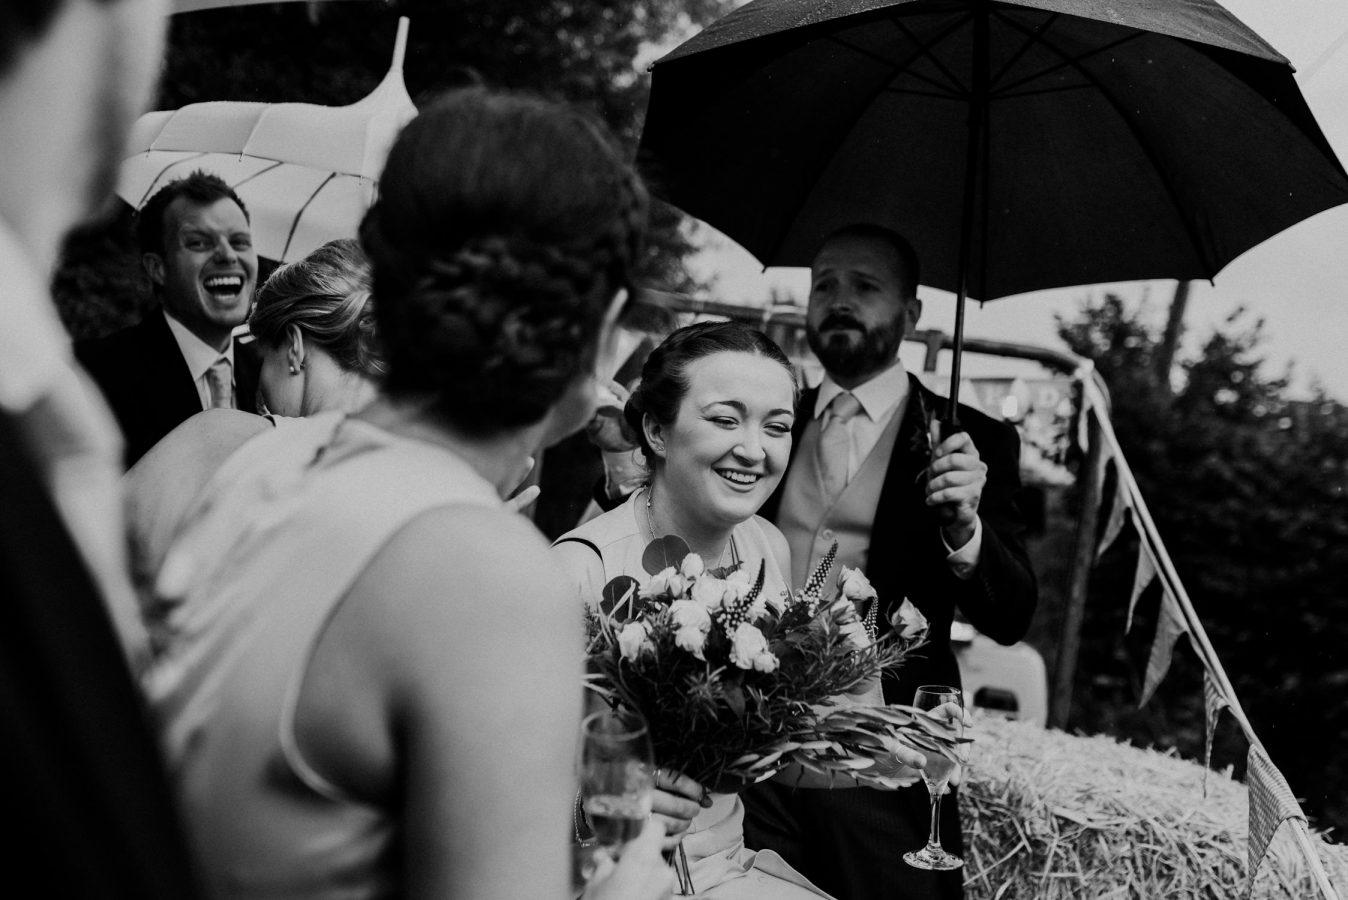 london-brighton-wedding-photographer-boho-modern-alternative-desination-fern-edwards